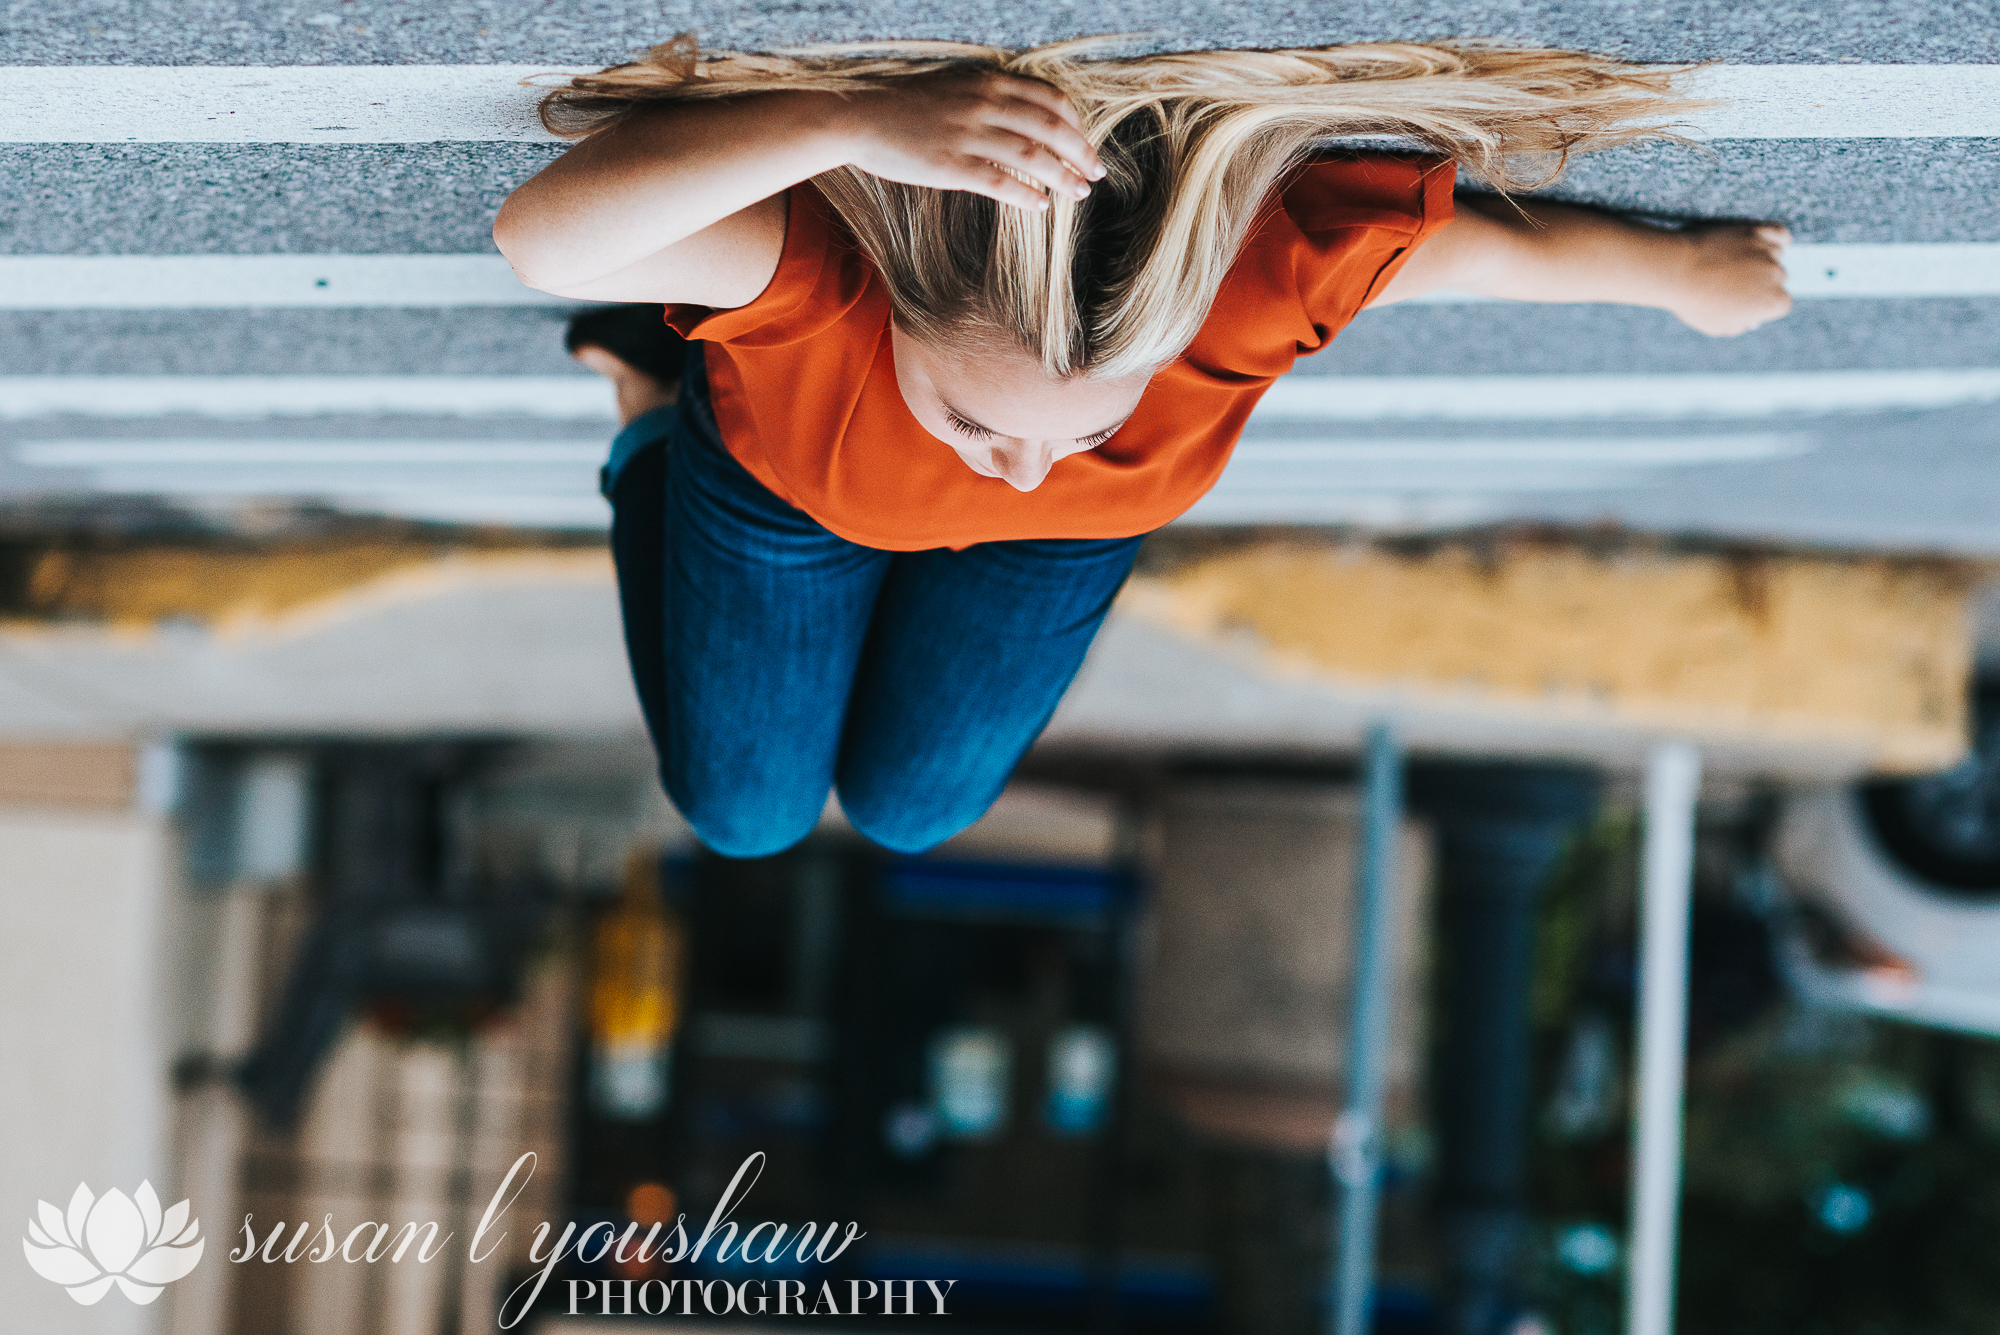 BLOG Karrie Bower 08-16-2018 SLY Photography LLC-15.jpg